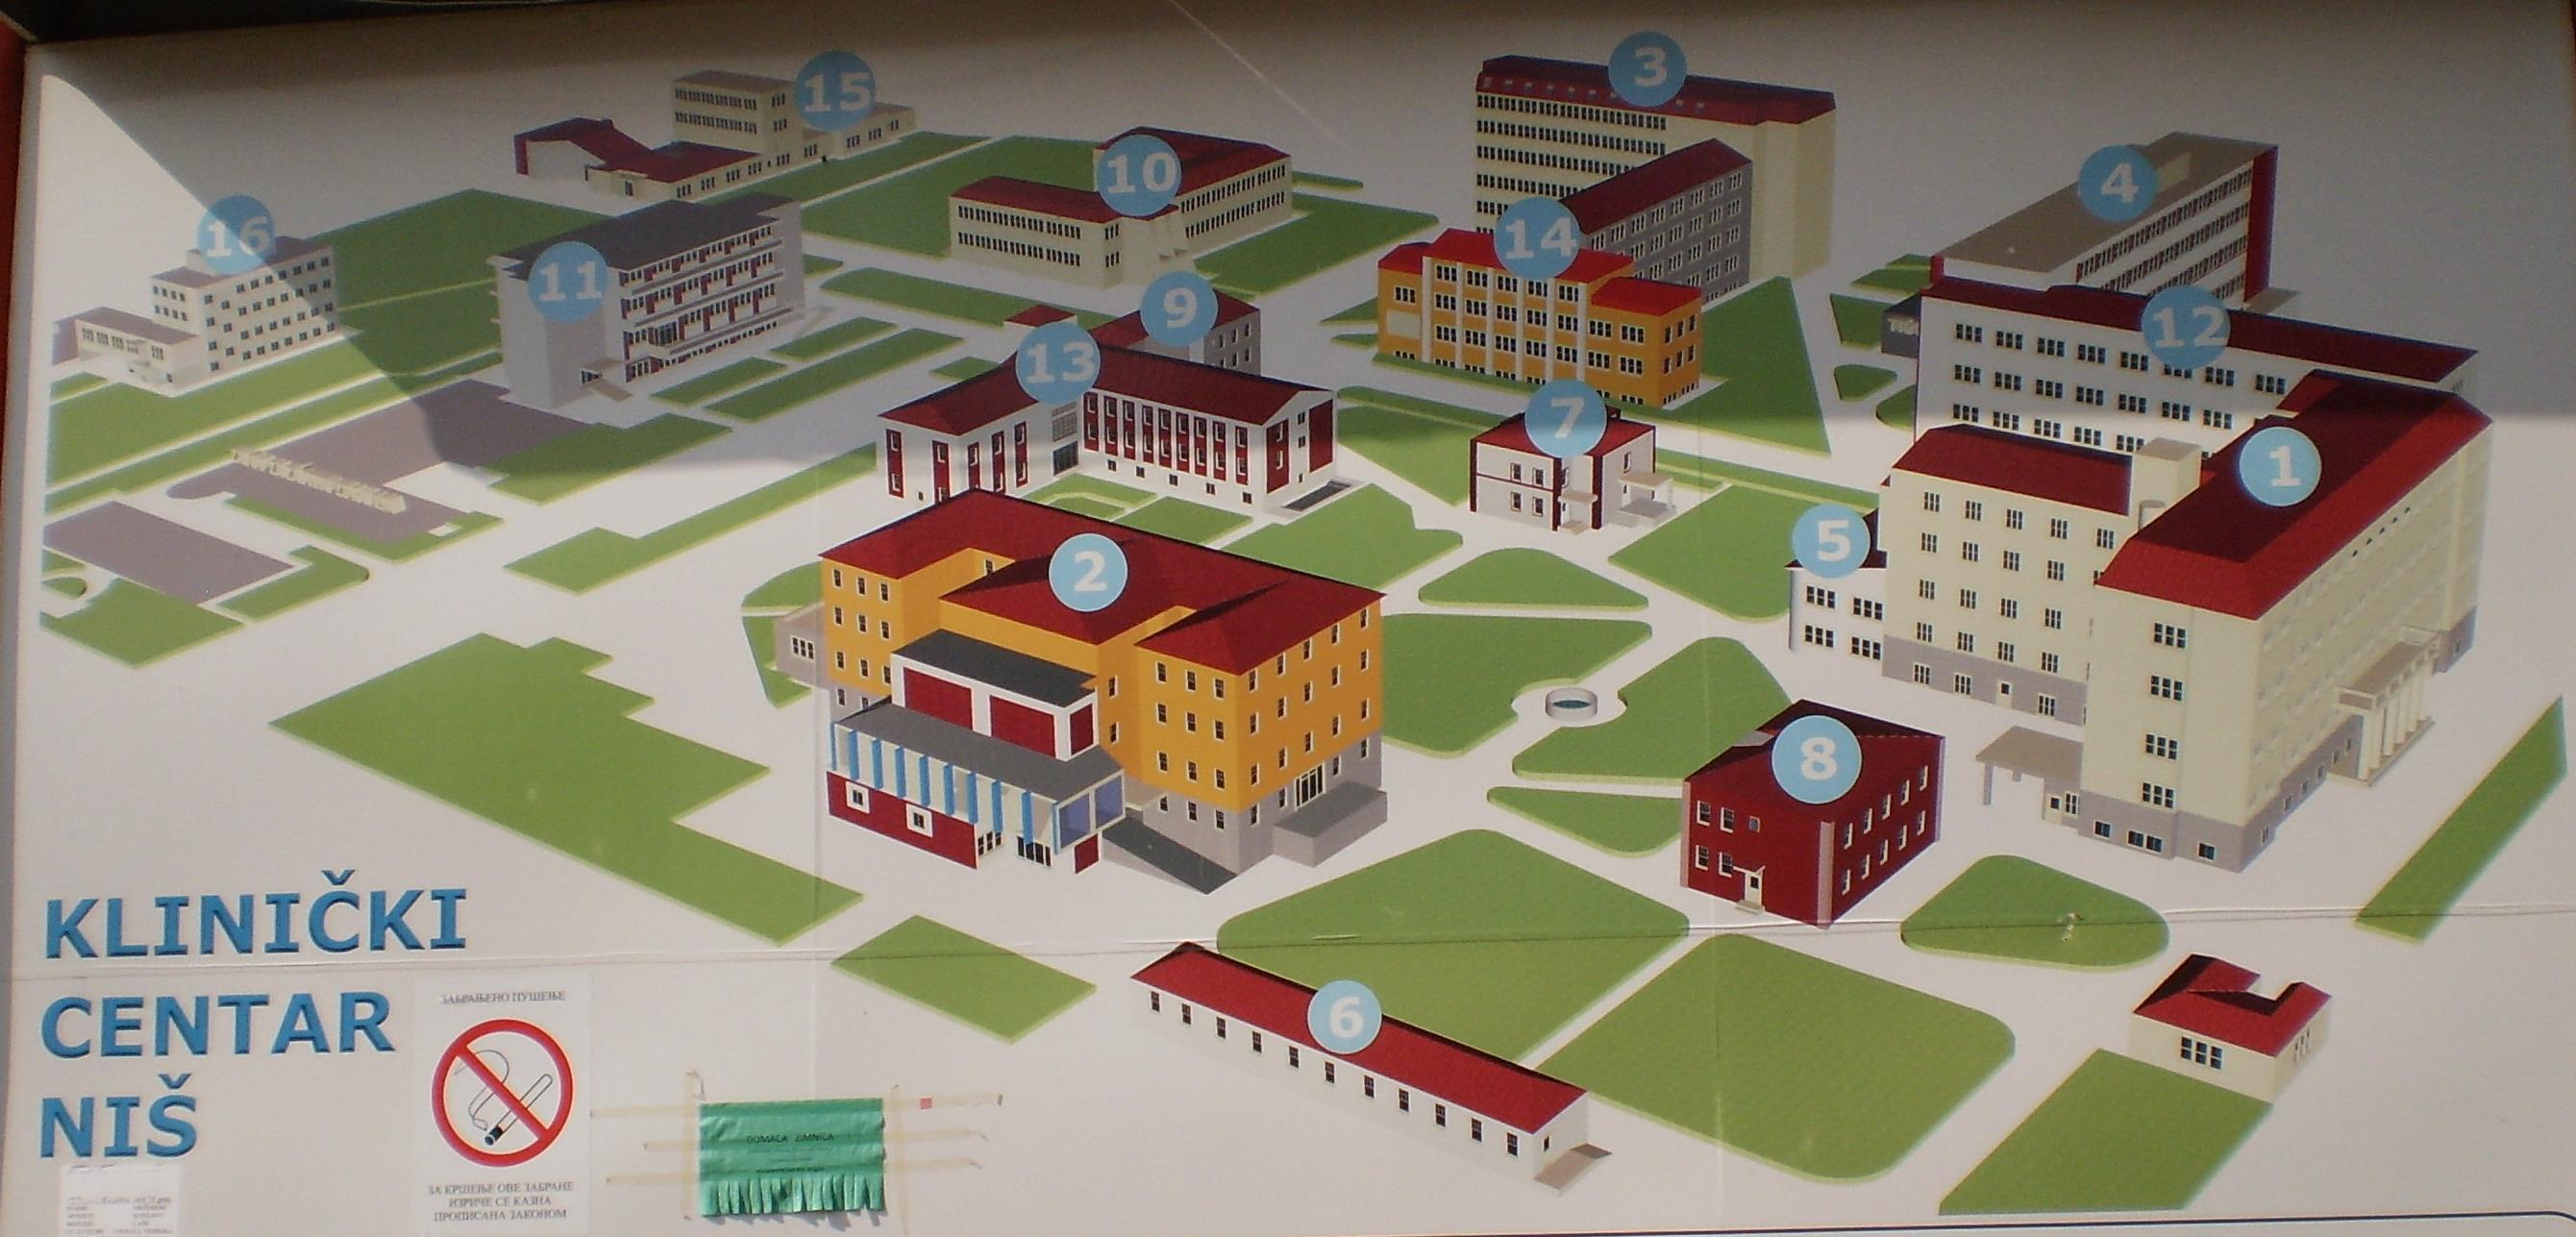 mapa klinickog centra srbije Клинички центар Ниш — Википедија, слободна енциклопедија mapa klinickog centra srbije